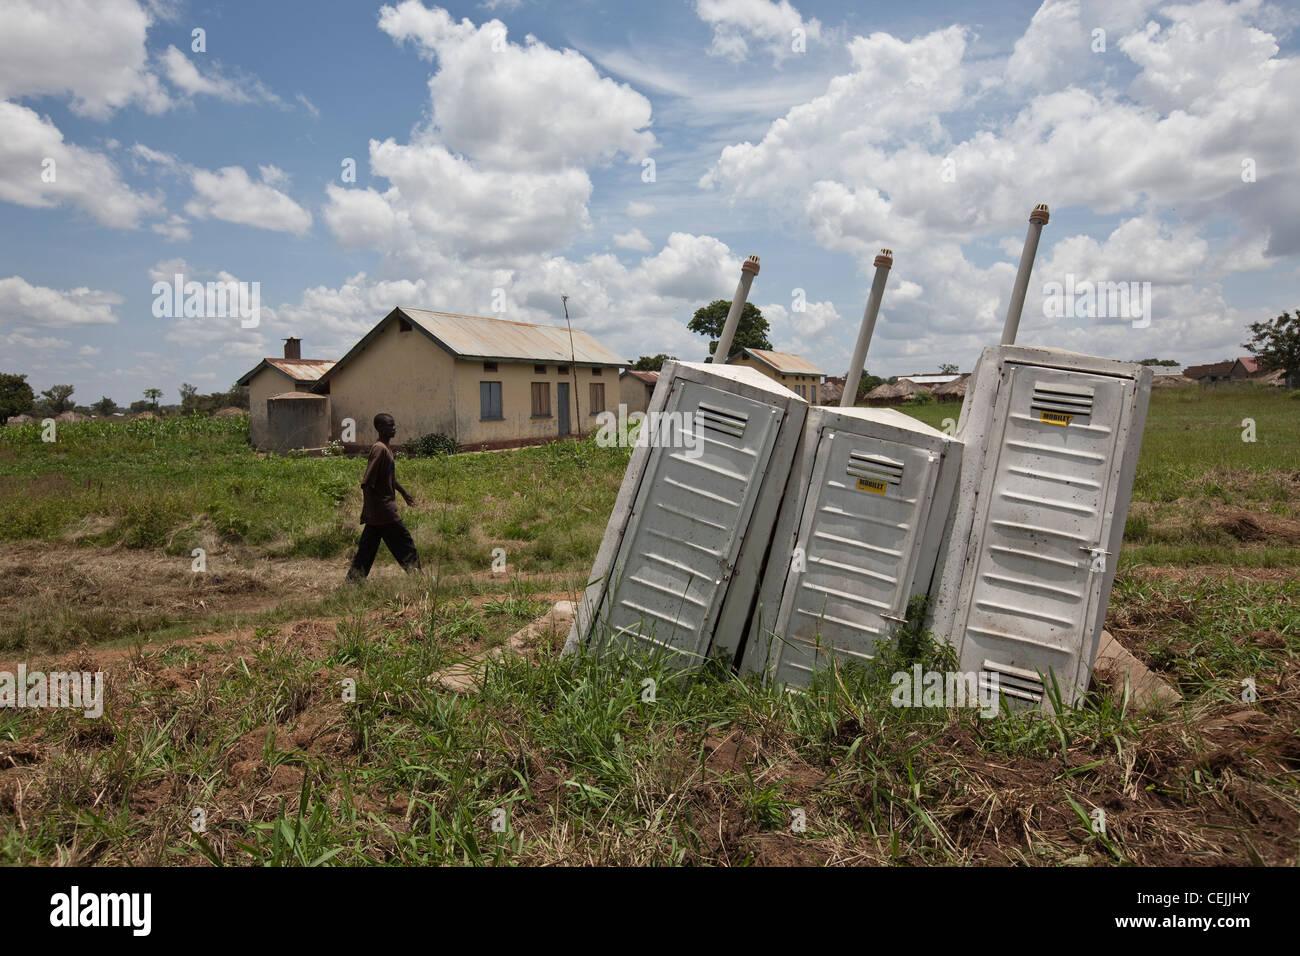 Dysfunctional toilets sit derelict in Amuria, Uganda, East Africa. - Stock Image